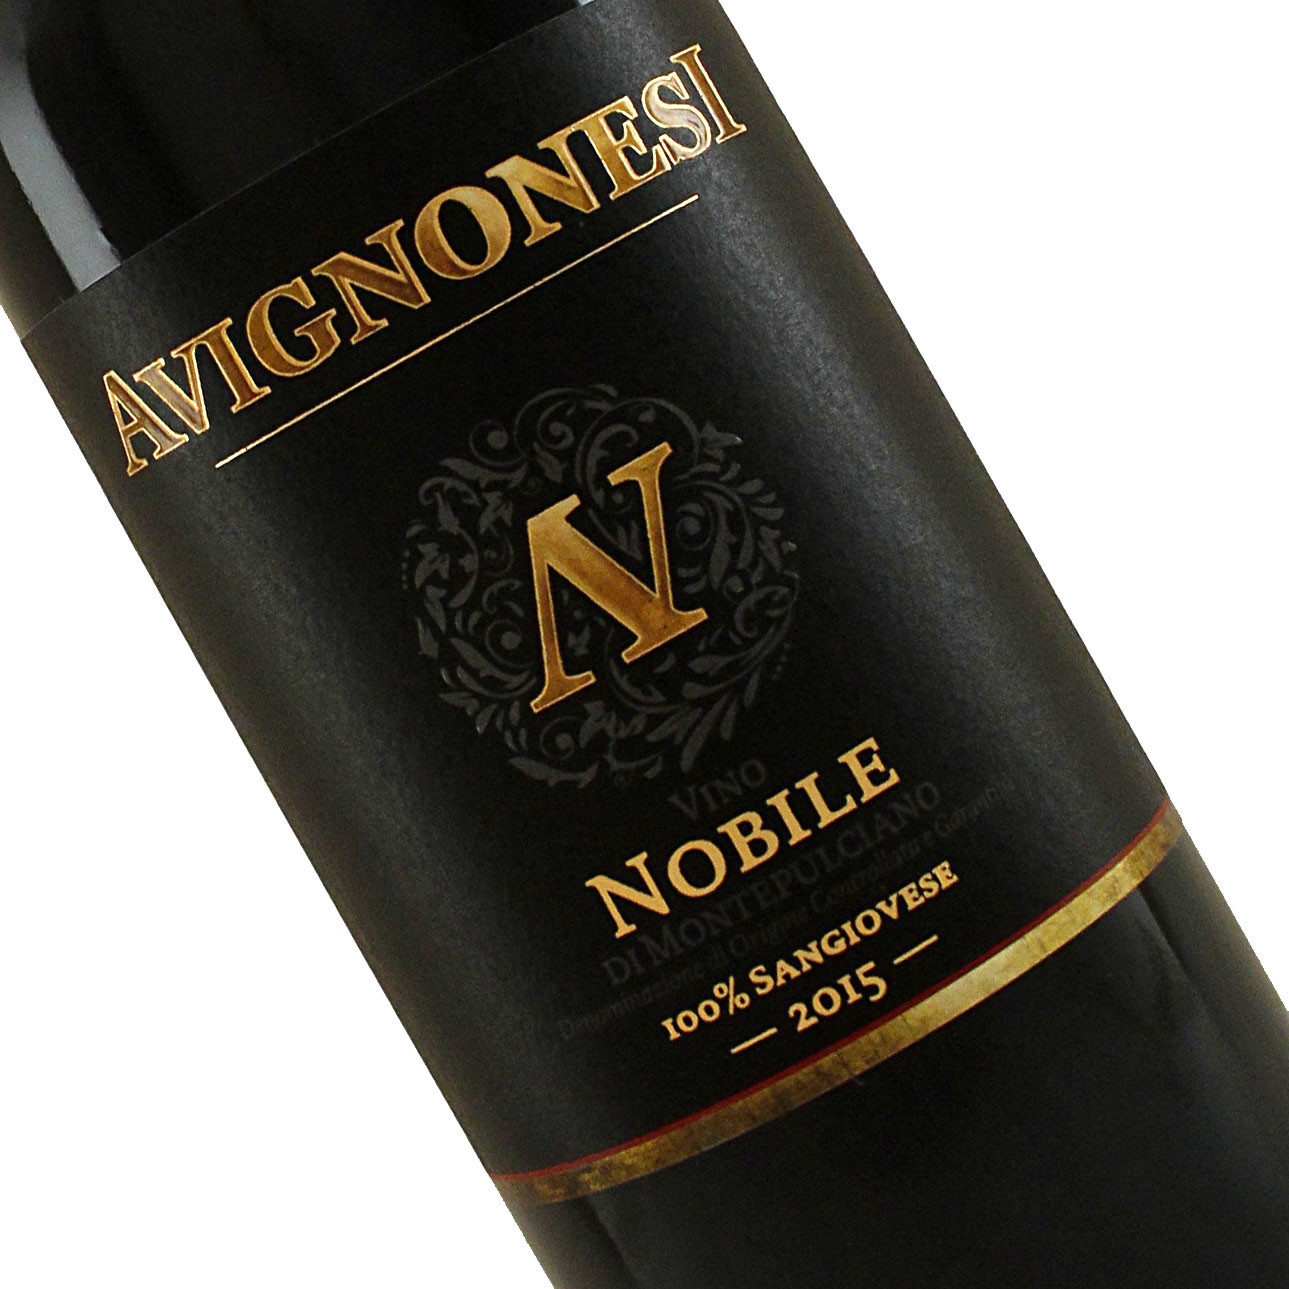 Avignonesi 2015 Vino Nobile di Montepulciano, Tuscany